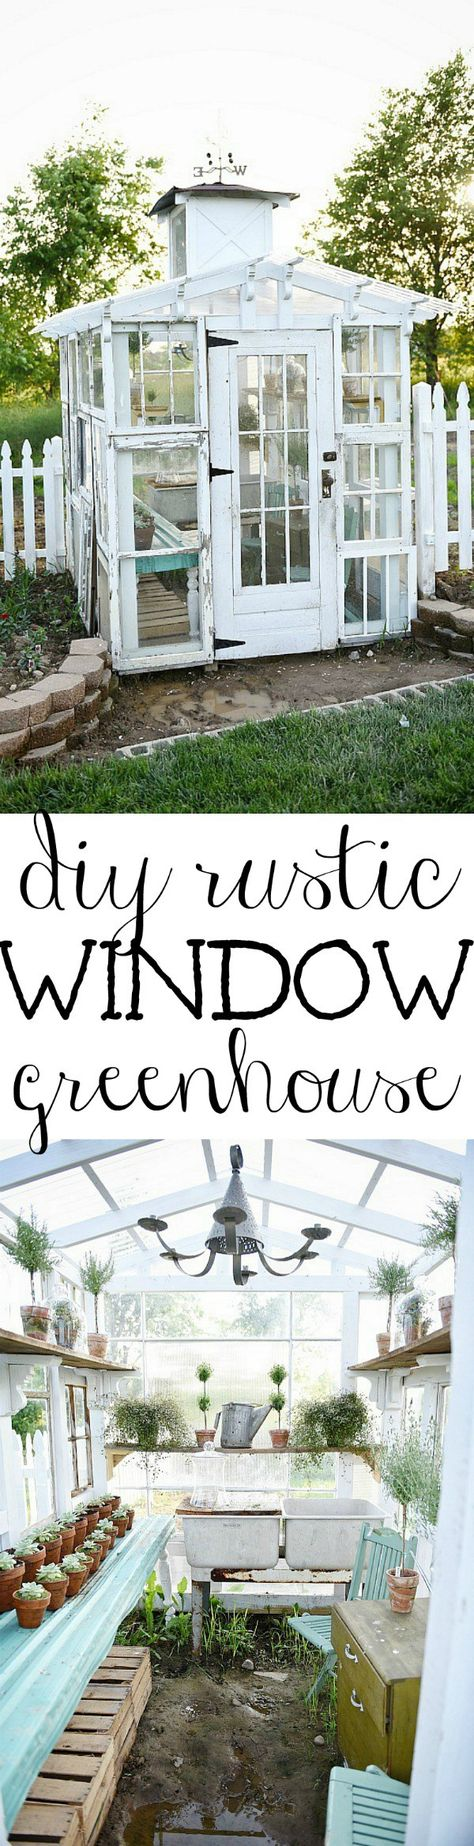 diy window greenhouse window greenhouse antique windows and window